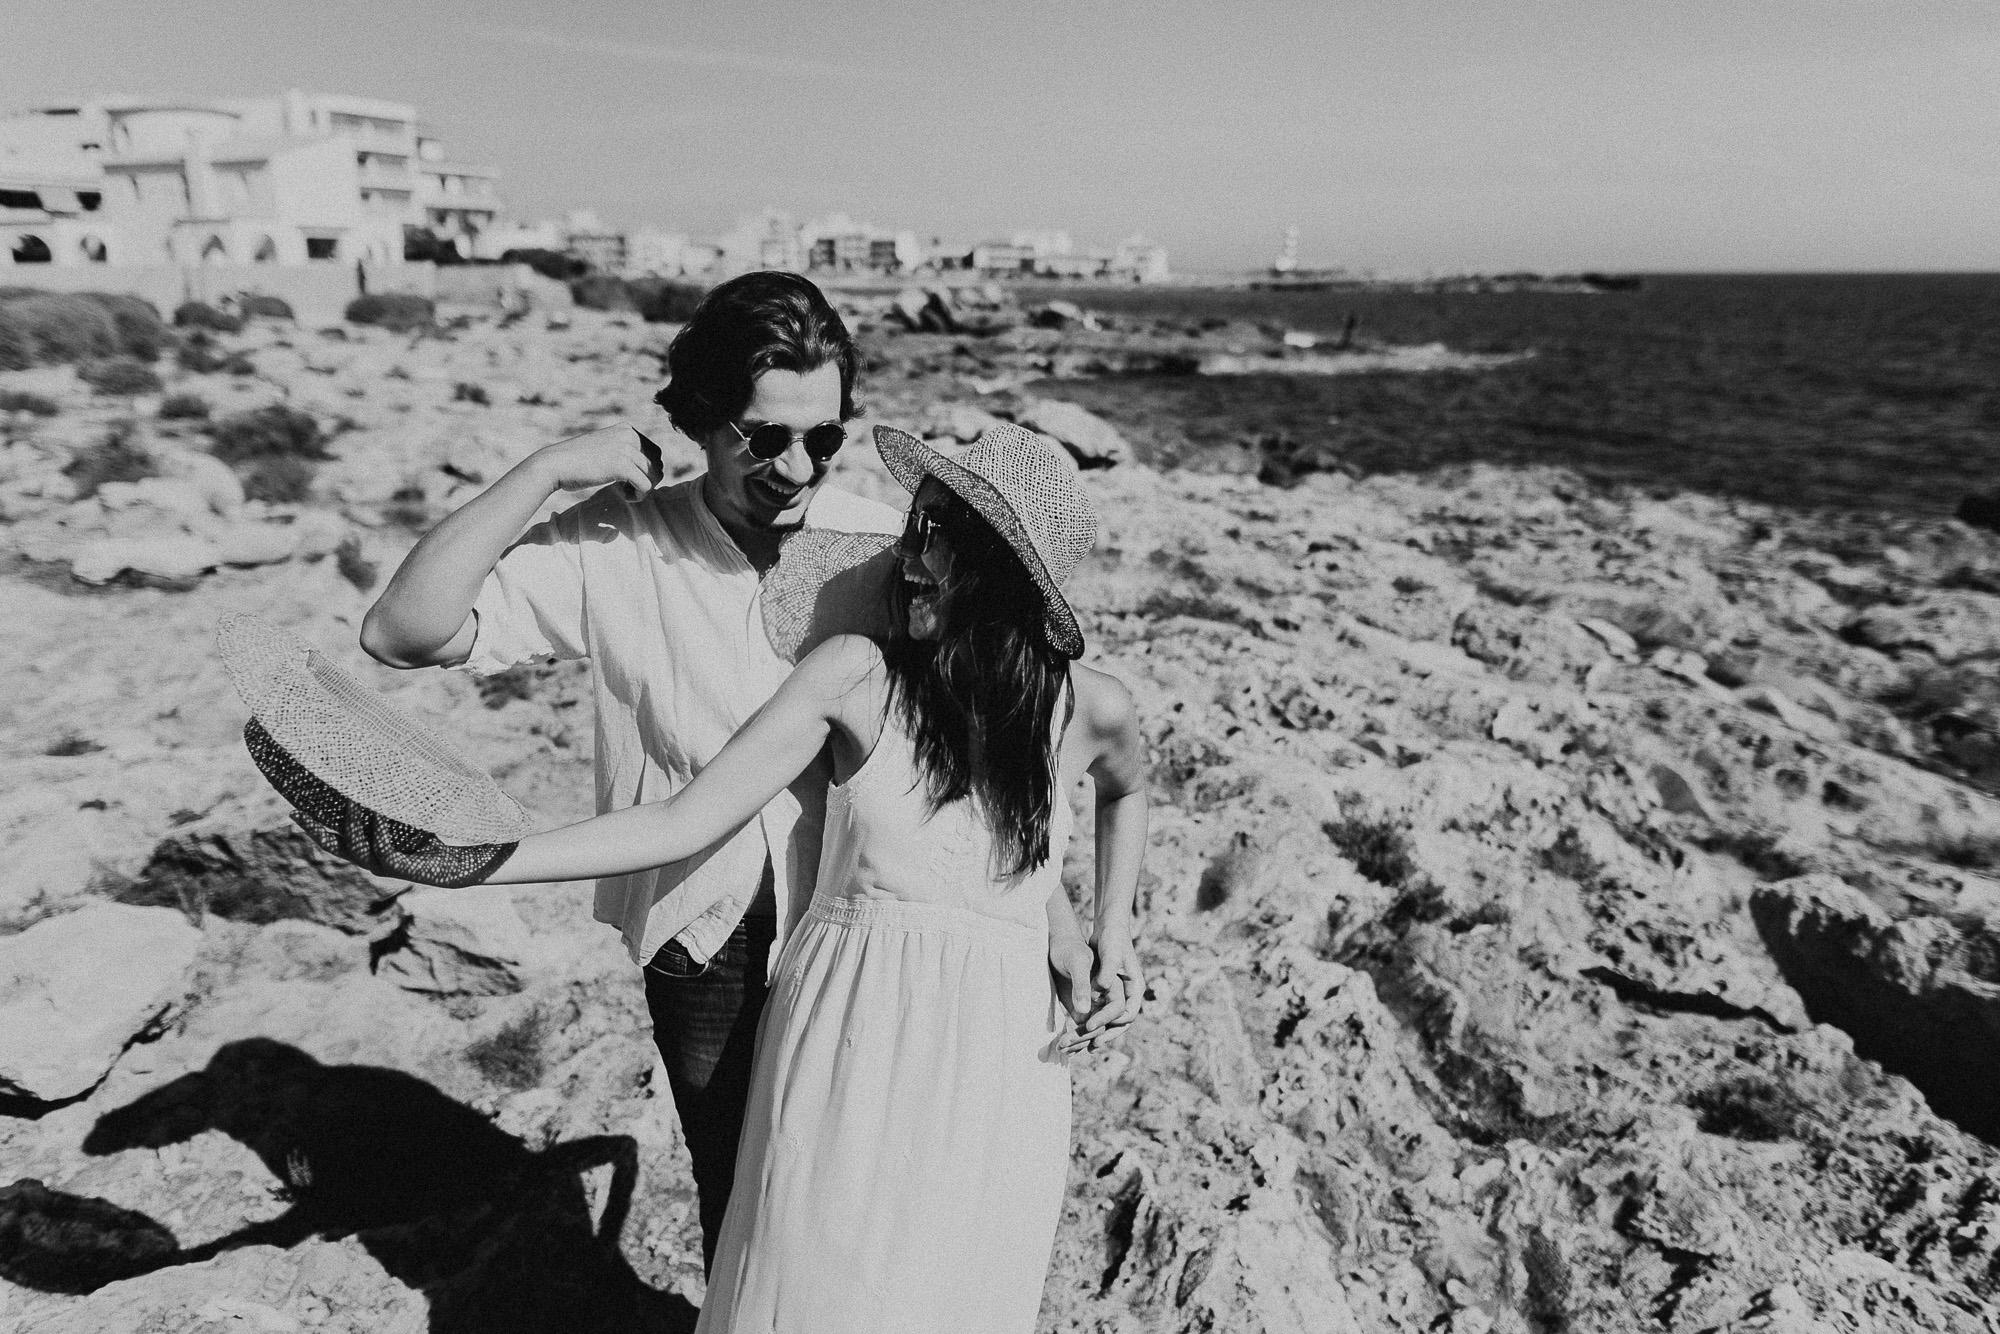 DanielaMarquardtPhotography_wedding_elopement_mallorca_spain_stjordi_sessalines_marinaandxavi337